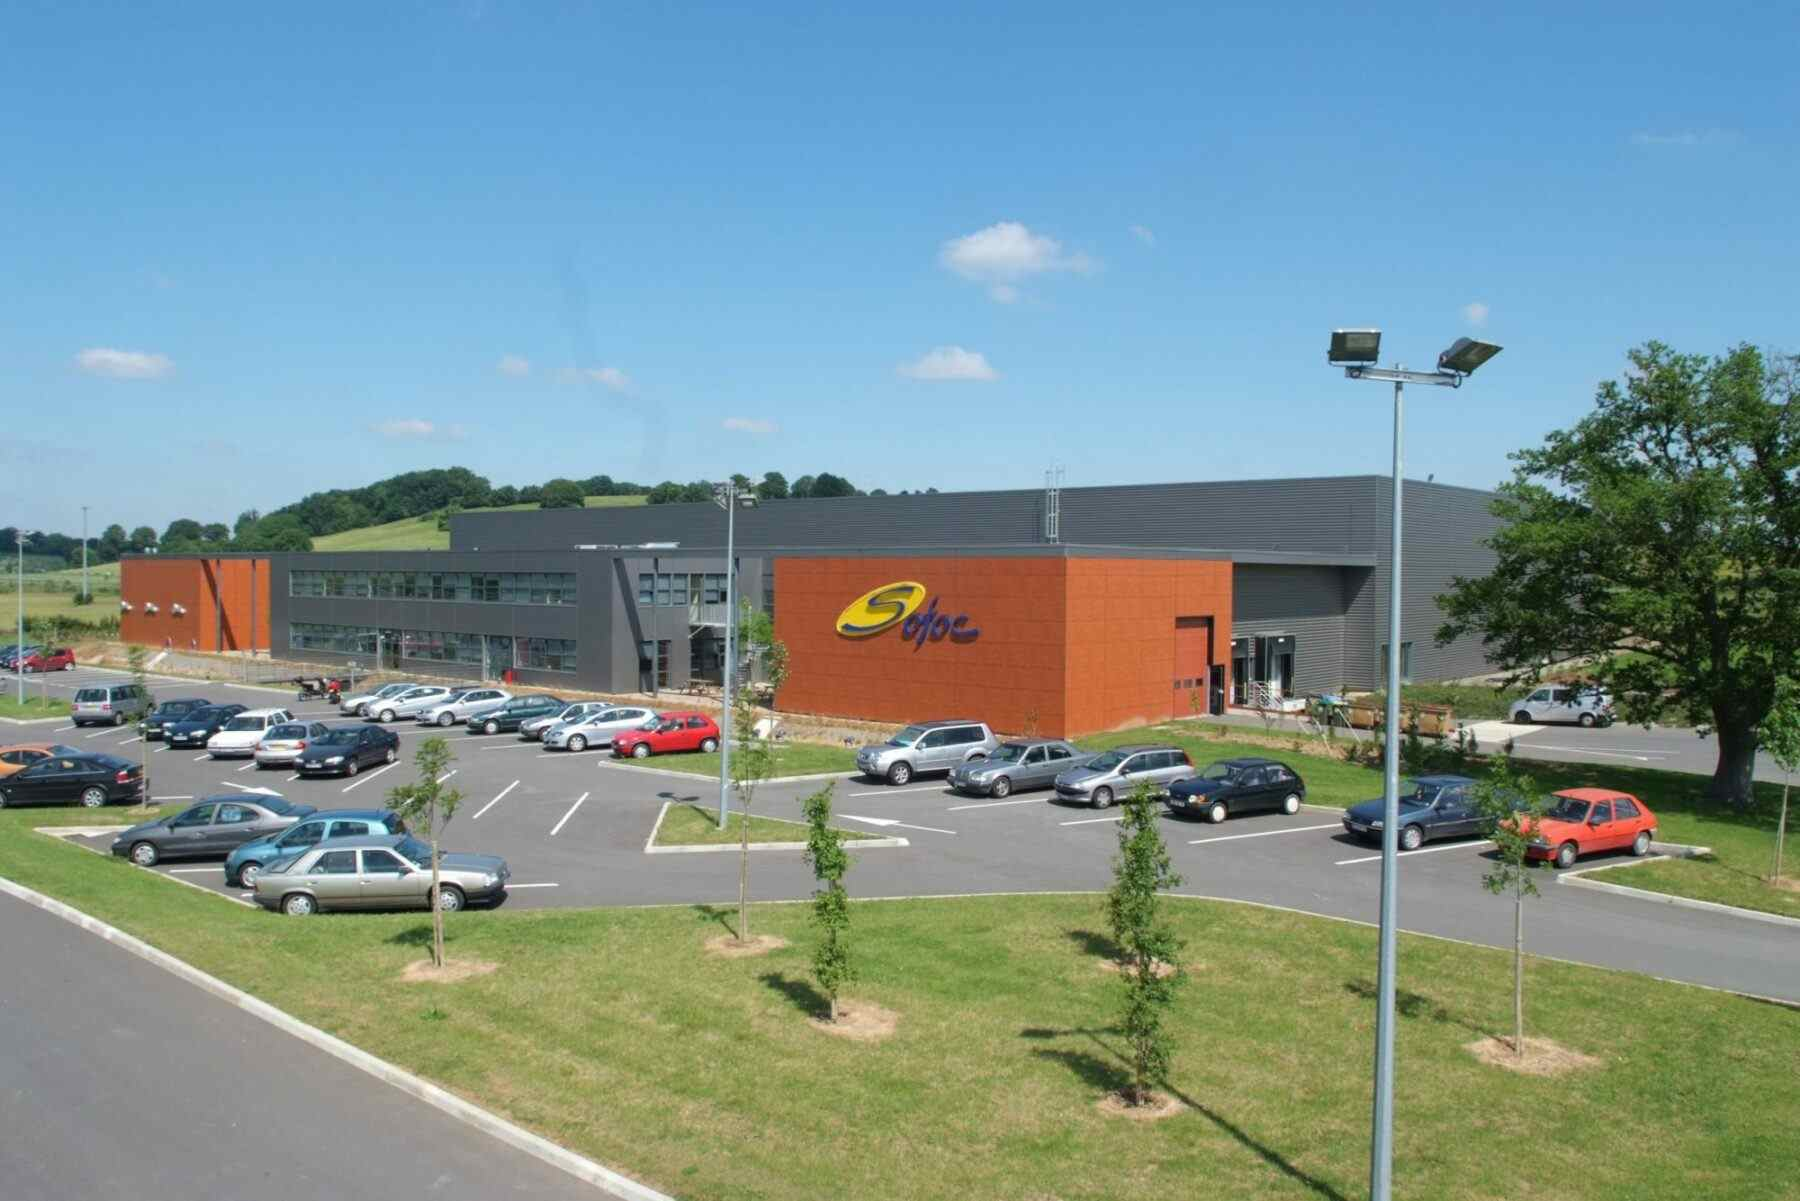 Vertriebszentrum Almar Südmetall Group France